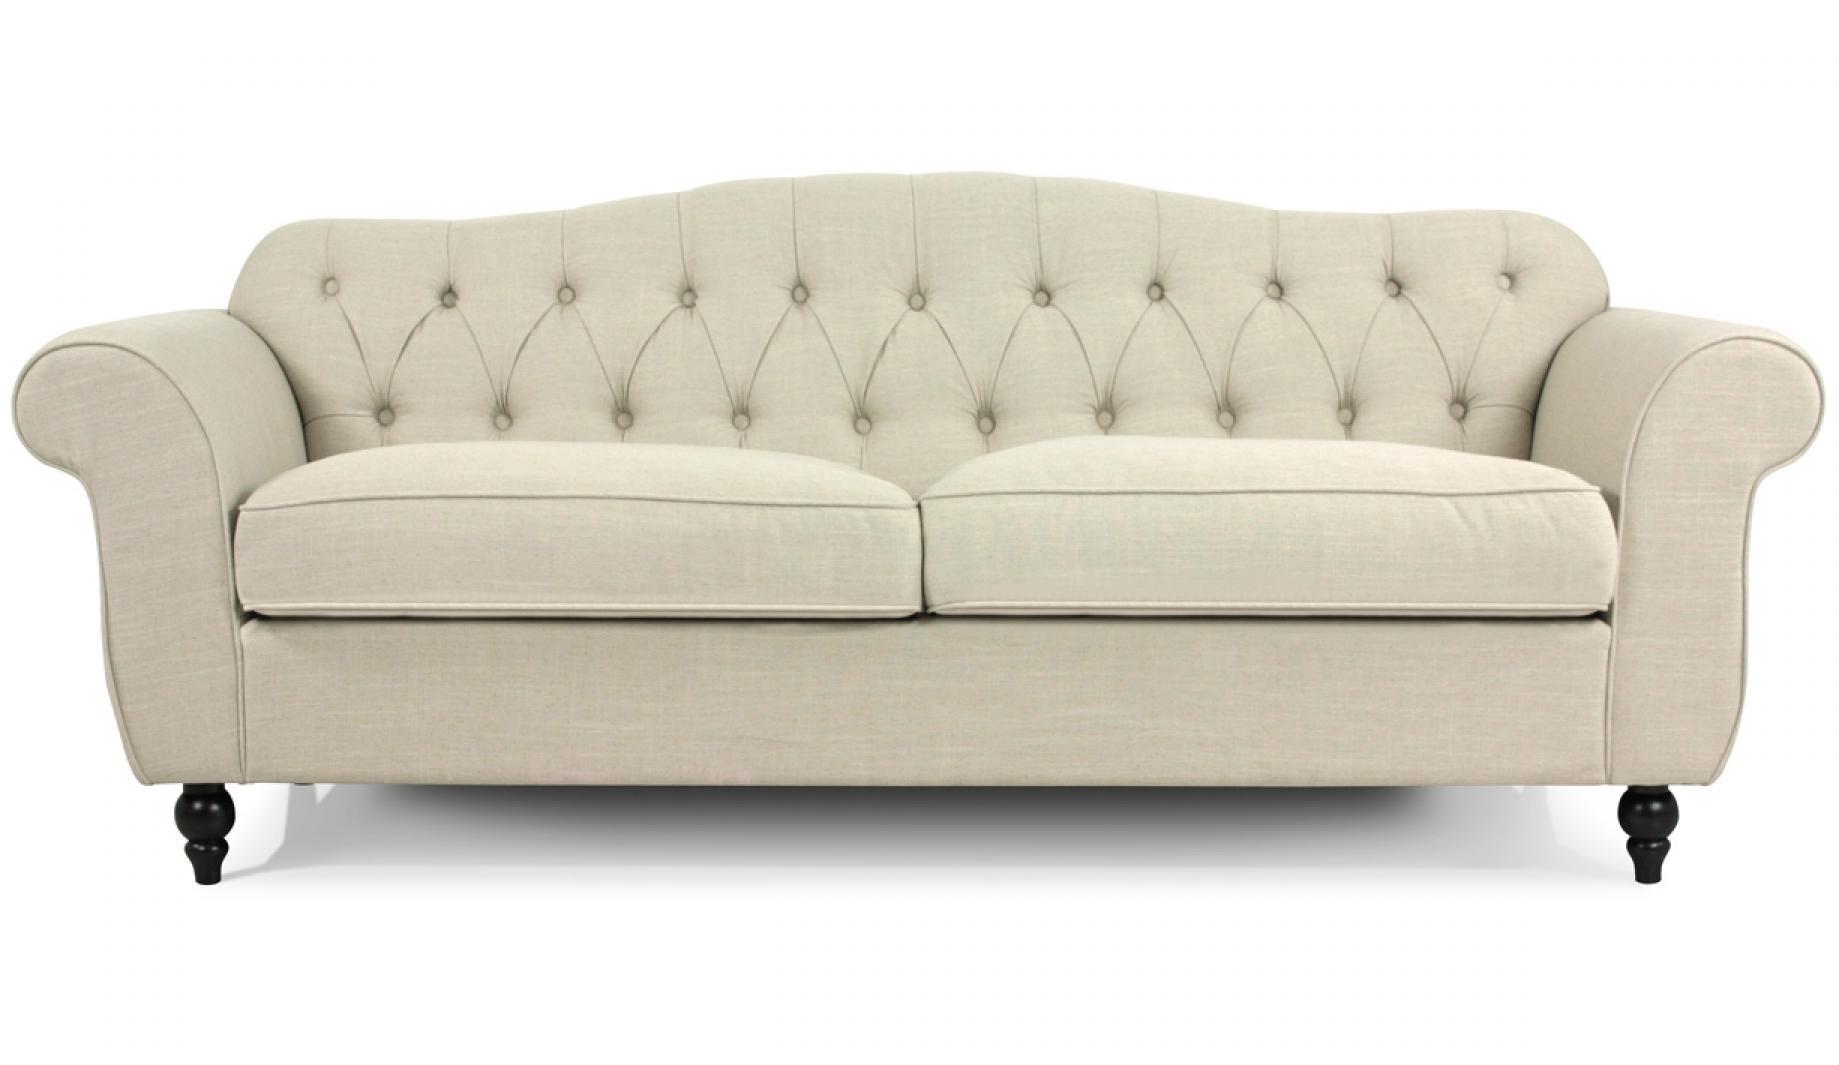 photos canap chesterfield tissu beige. Black Bedroom Furniture Sets. Home Design Ideas